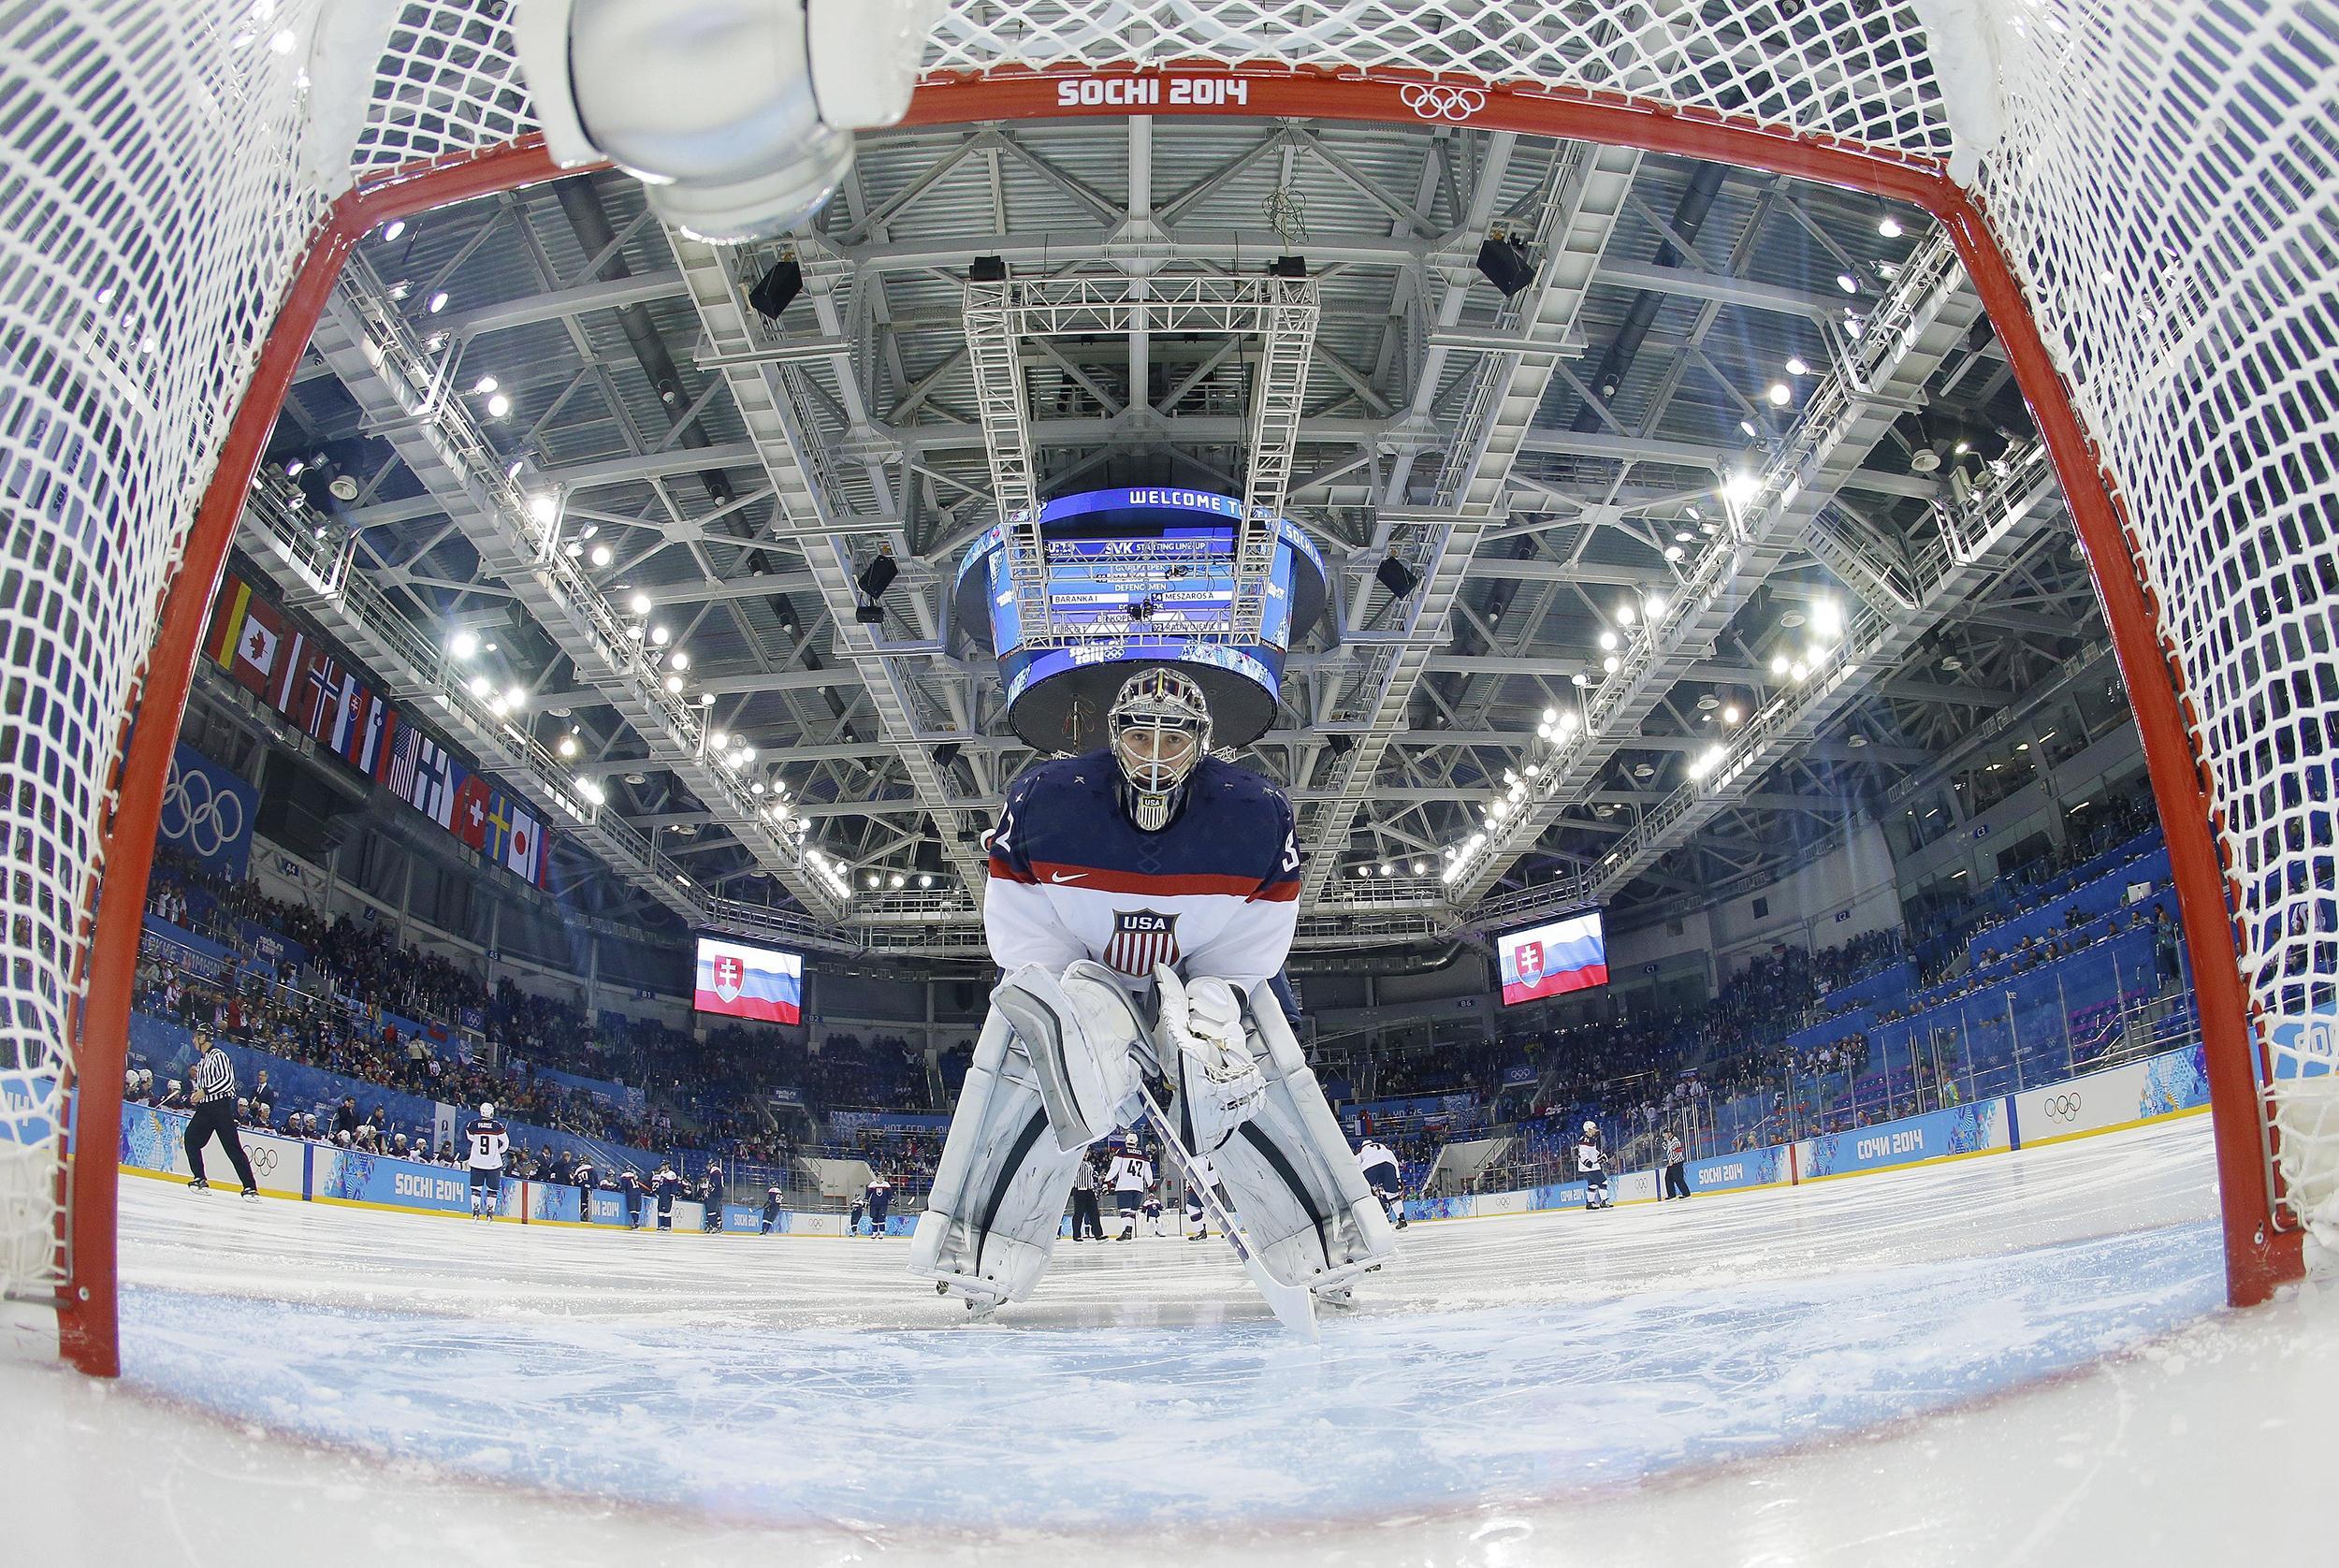 Men s ice hockey tournament at the 2014 winter olympics on feb 13